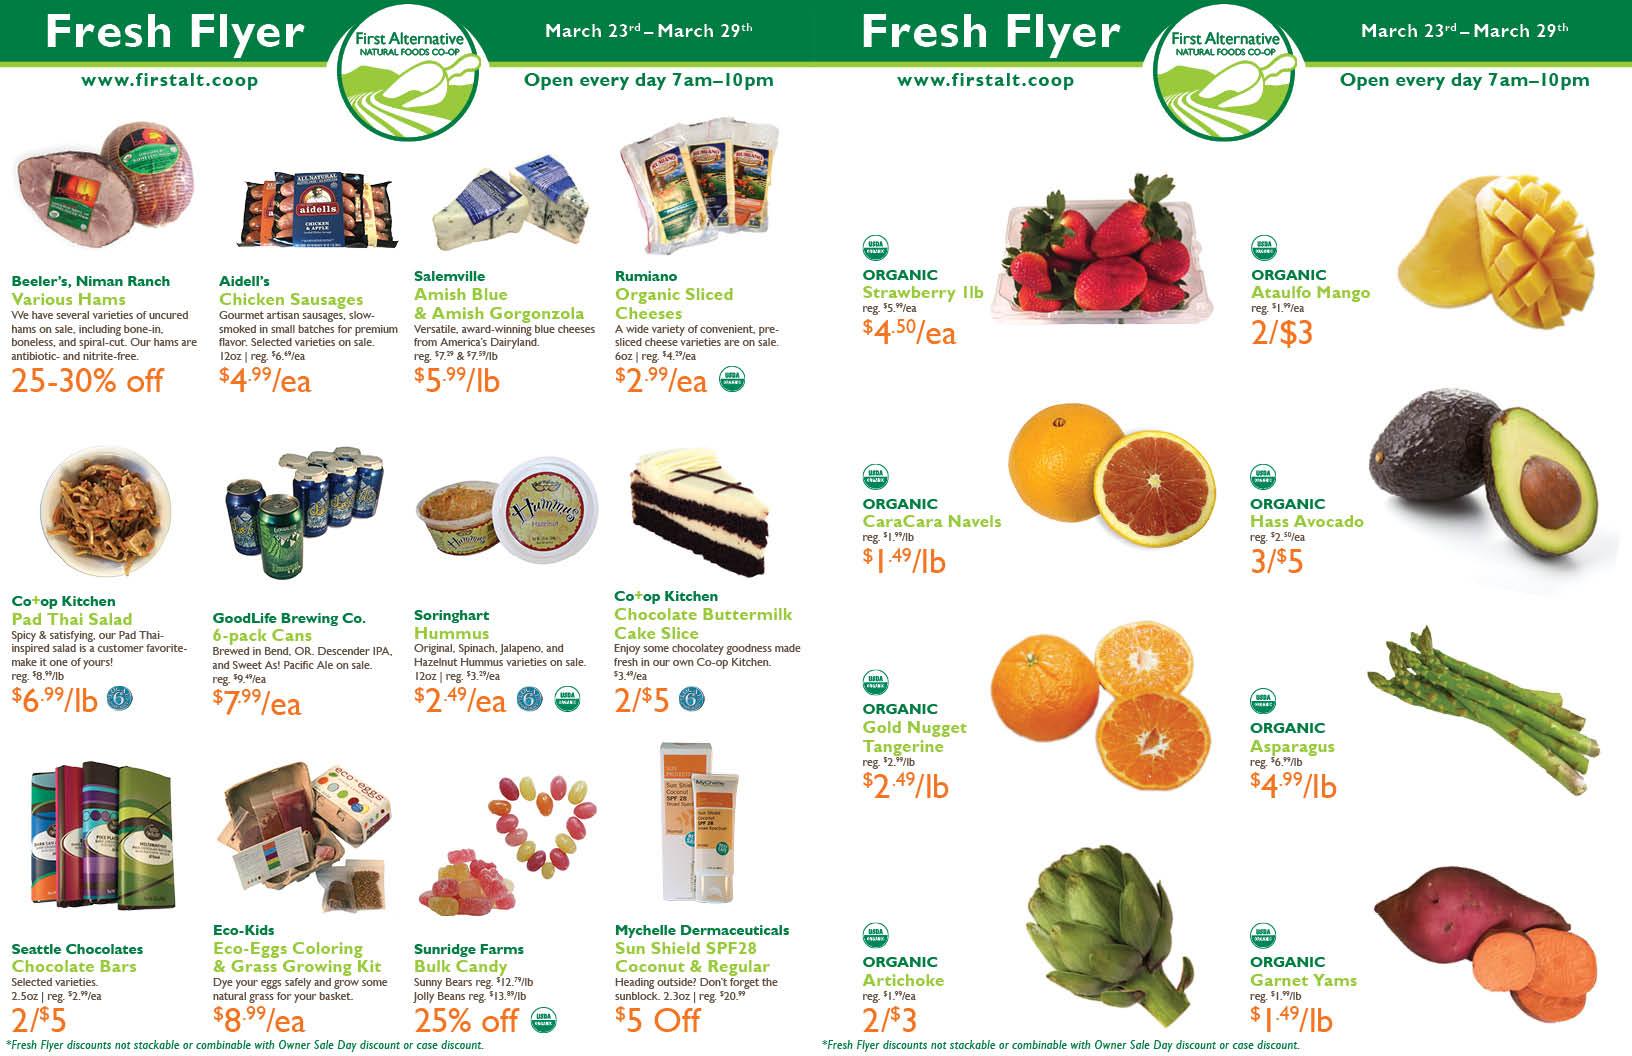 First Alternative Co-op Fresh Flyer March 9 - March 15